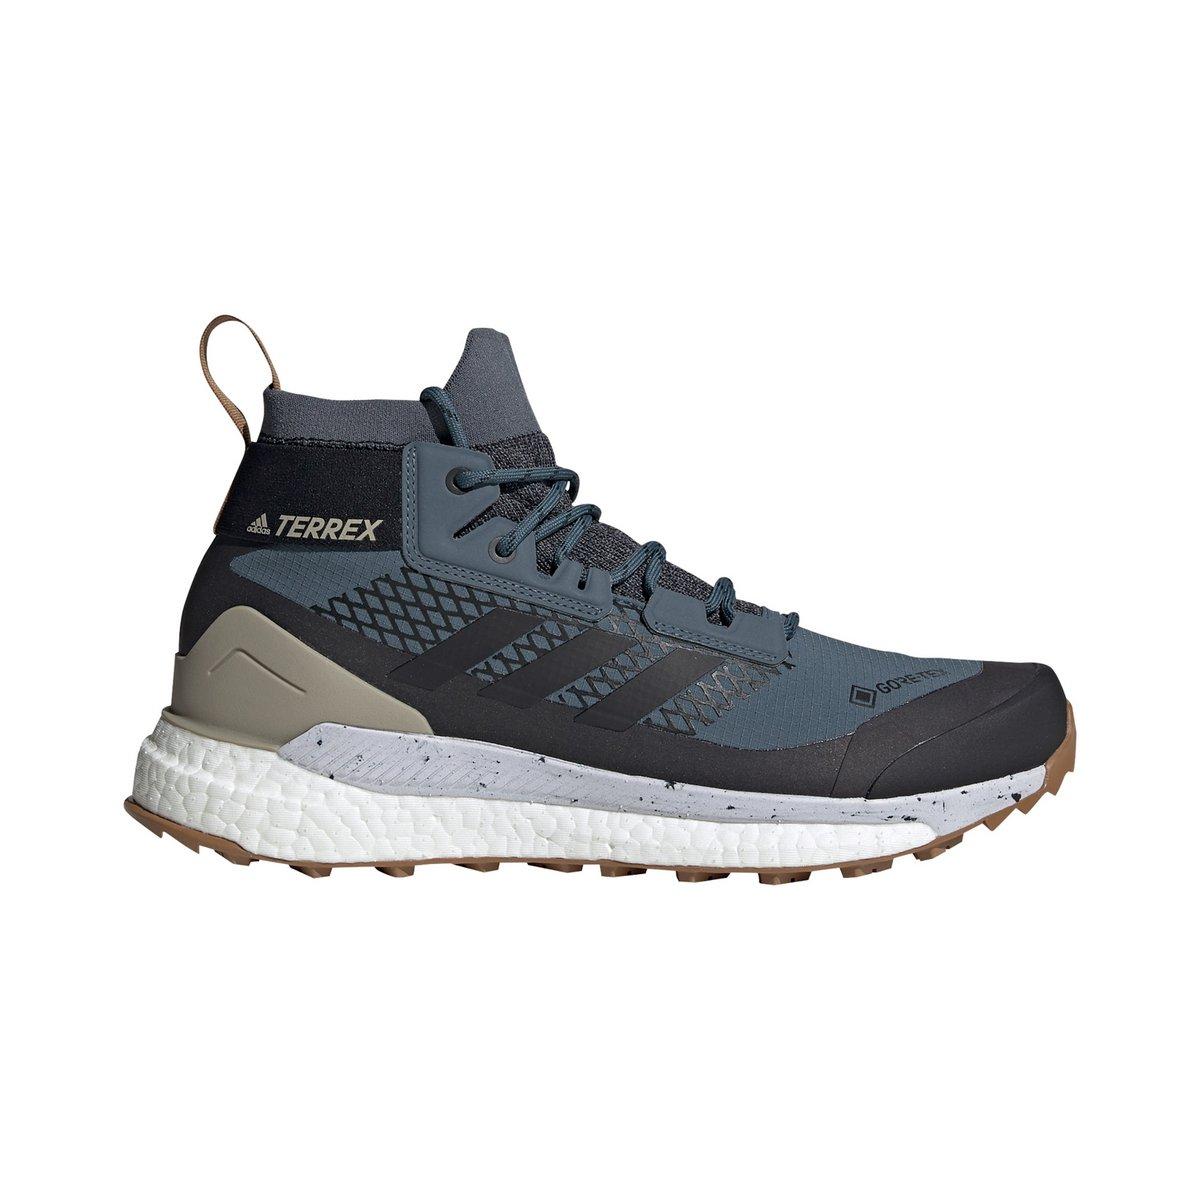 Adidas Terrex Men's Free Hiker GORE-TEX Shoes 0